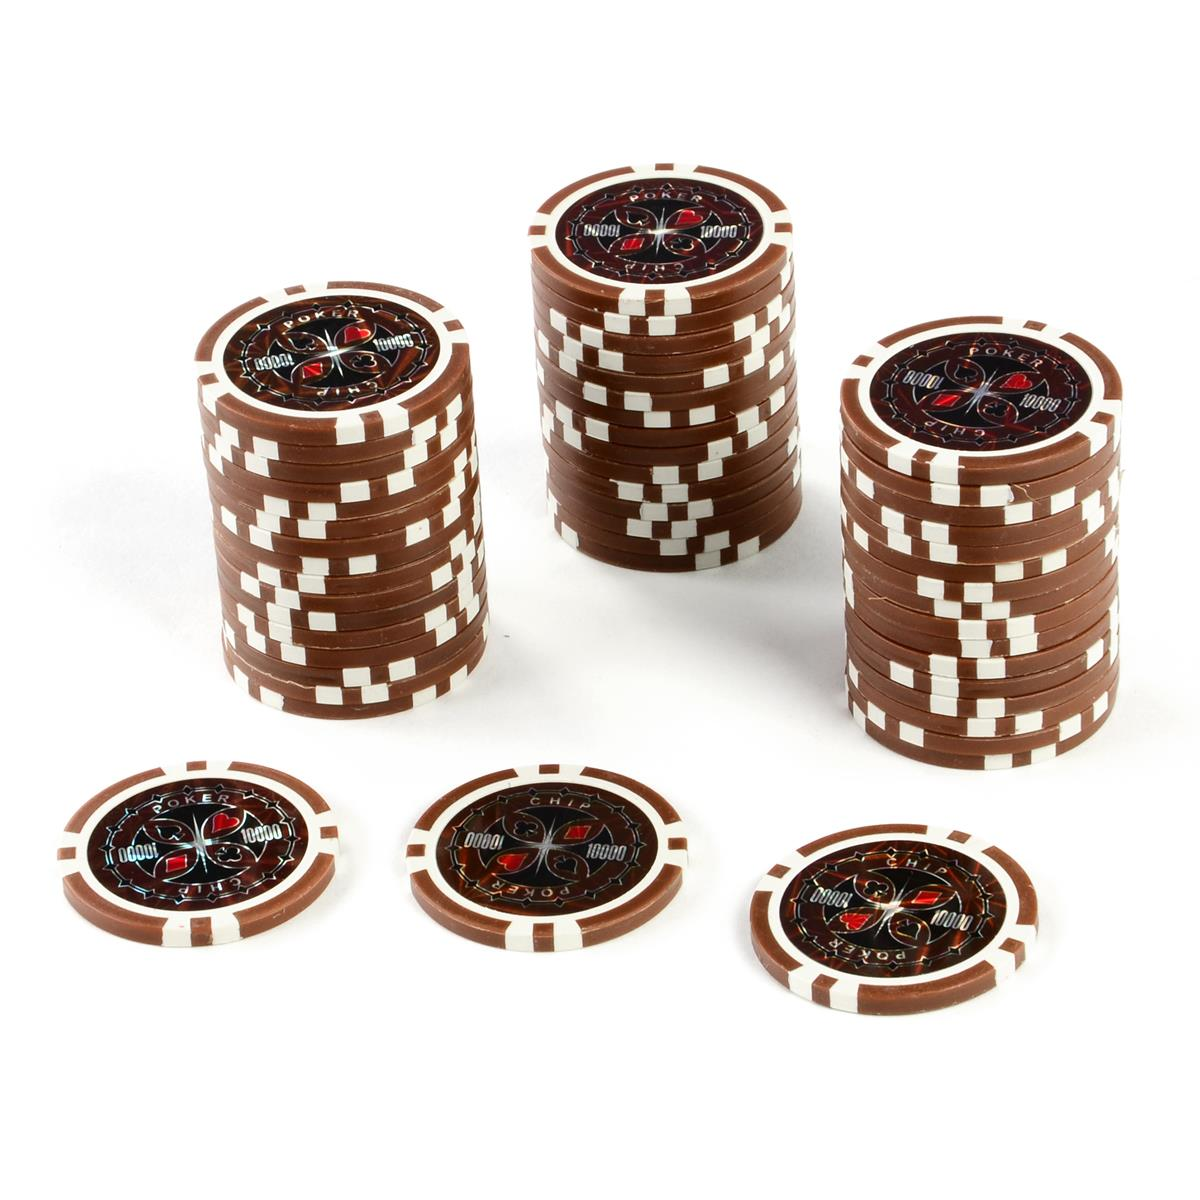 50 Poker-Chips Wert 10.000 Laserchip 12g Metallkern ergänzend zum Pokerkoffer